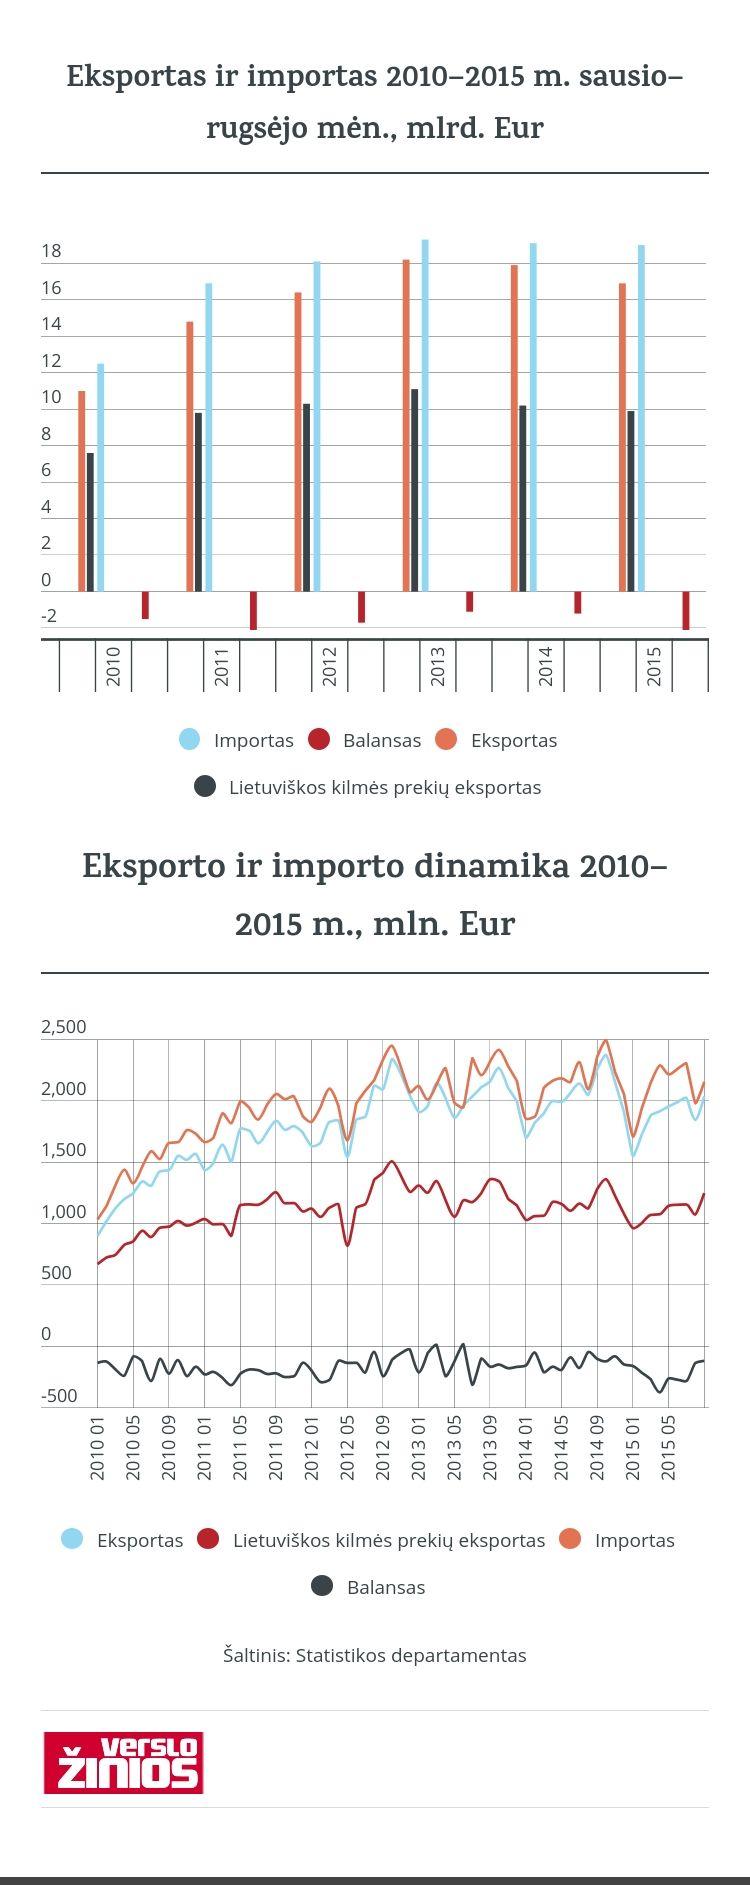 Pagrindine eksporto kryptimi išlieka Rusija